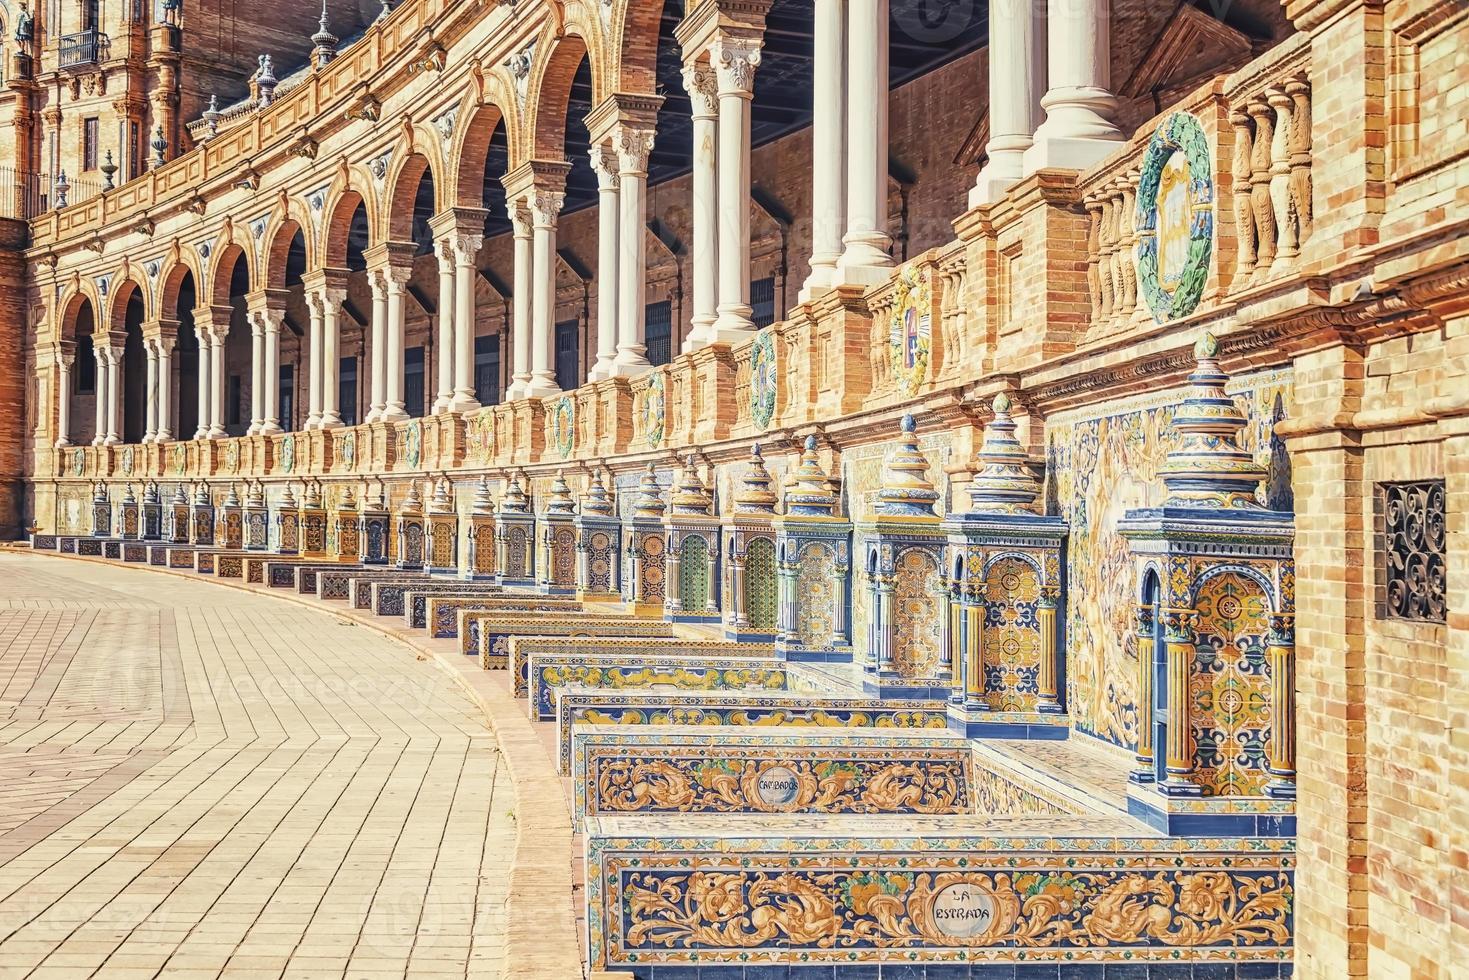 Plaza de Espana in Seville, Andalusia, Spain photo